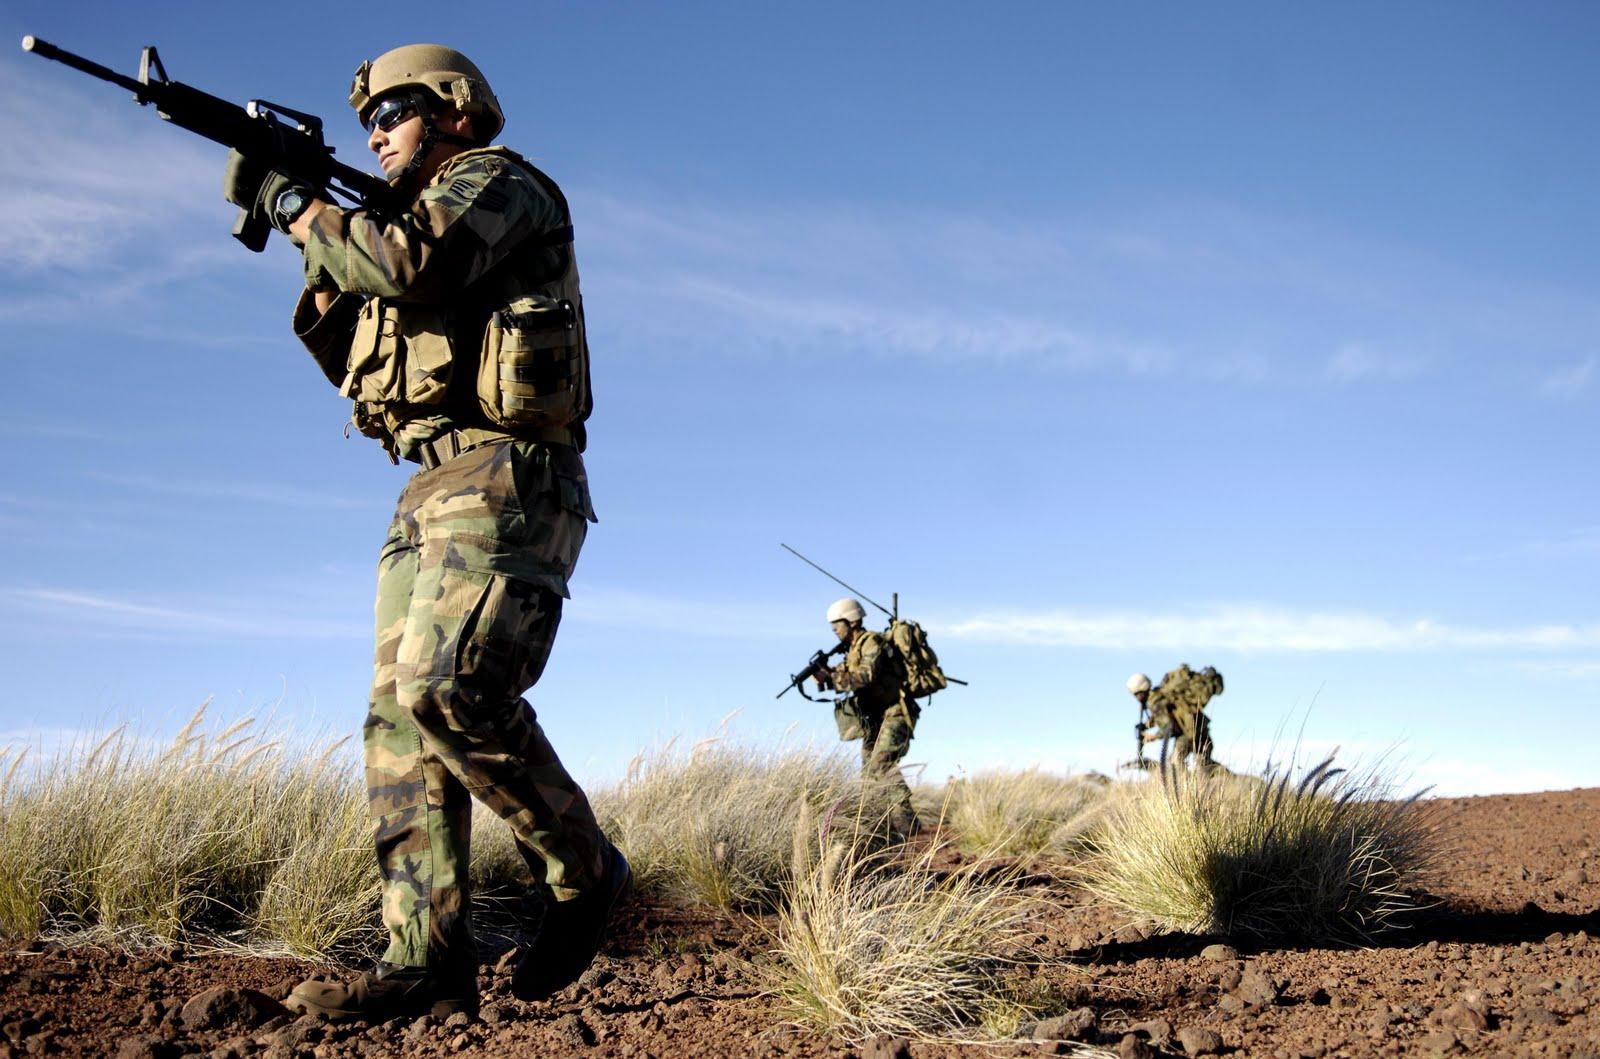 s1600Army Military Man High Resolution Wallpapersstillmazacom 2jpg 1600x1059